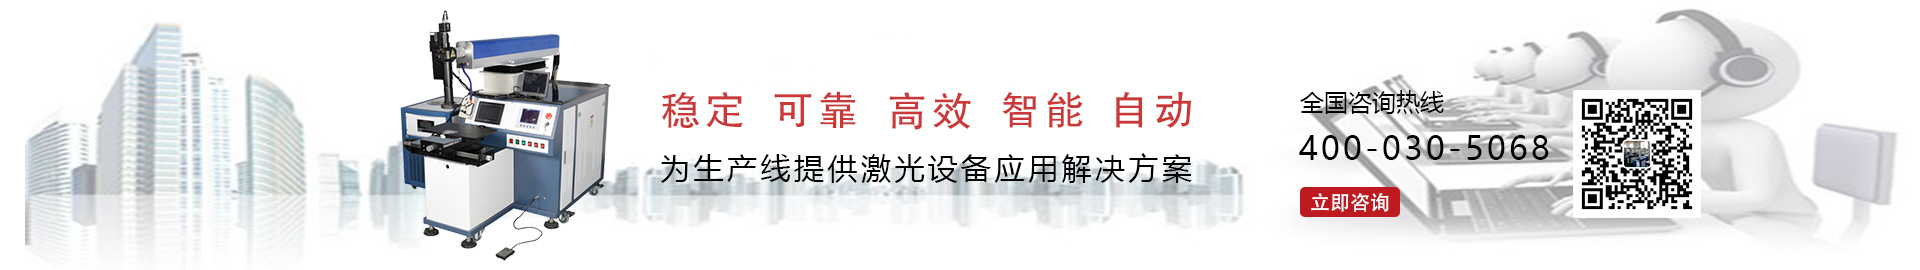 http://p.qiao.baidu.com/cps/chat?siteId=13569246&userId=24260167&cp=www.dabiaoji.com.cn%2Fduli&cr=www.dabiaoji.com.cn%2Fduli&cw=%E4%BA%A7%E5%93%81%E9%A1%B5%E9%9D%A2%E5%92%A8%E8%AF%A2